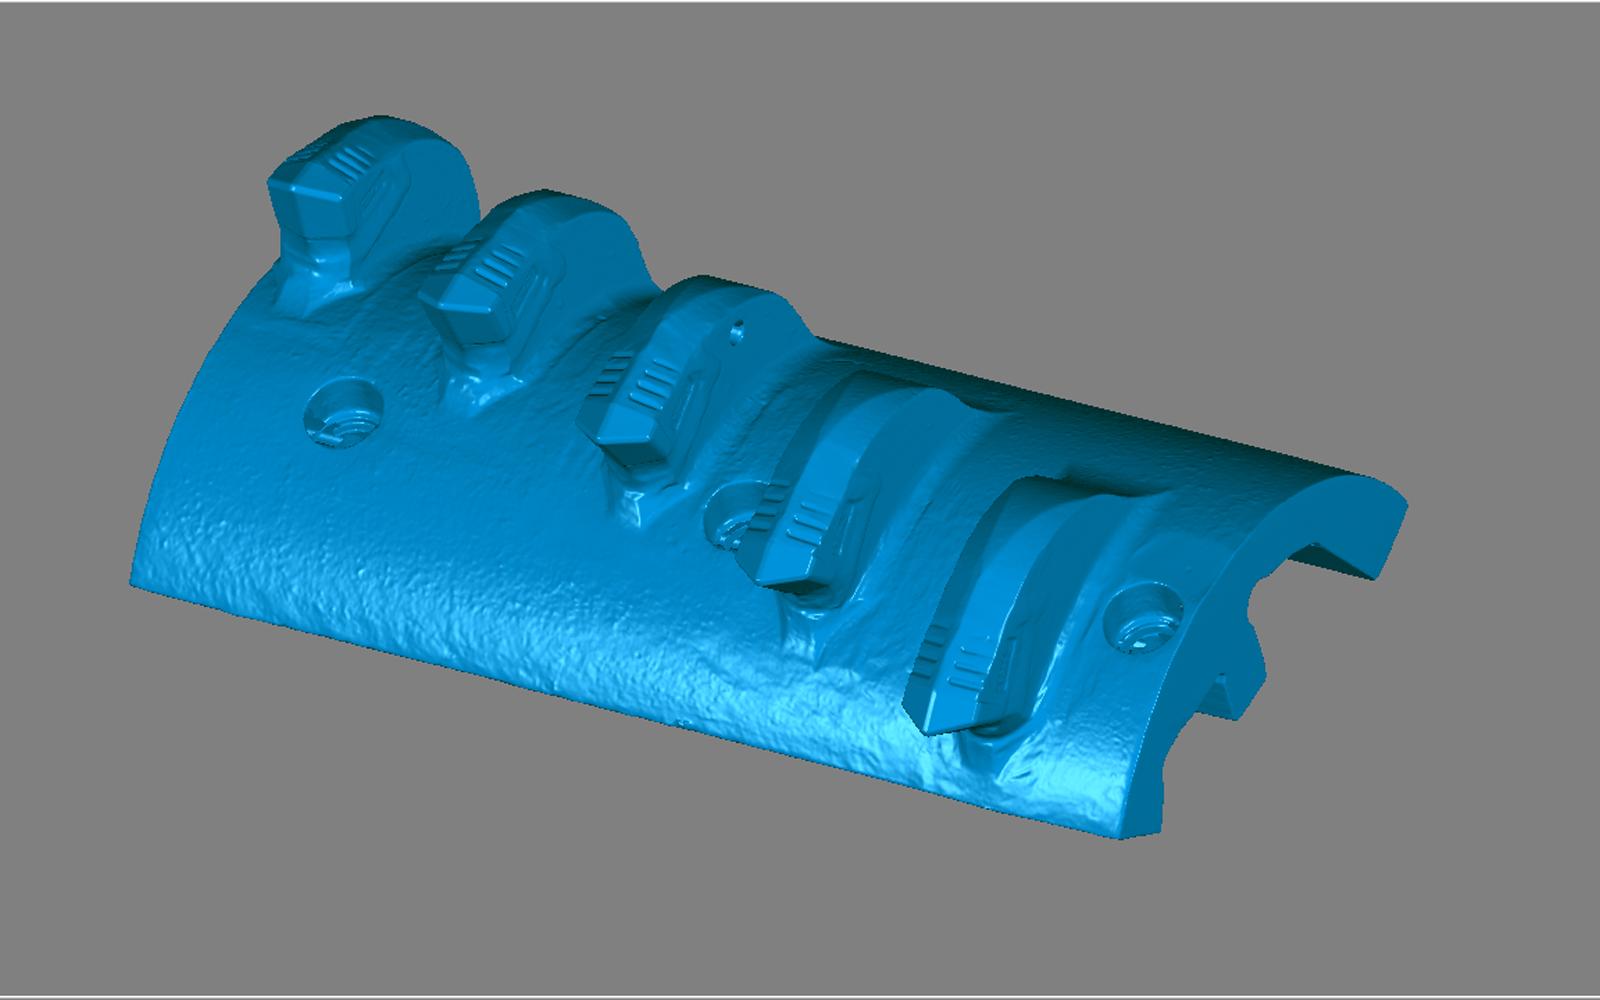 Conap 3D Reverse Engineering - CAD Modell eines Kohlebrechers